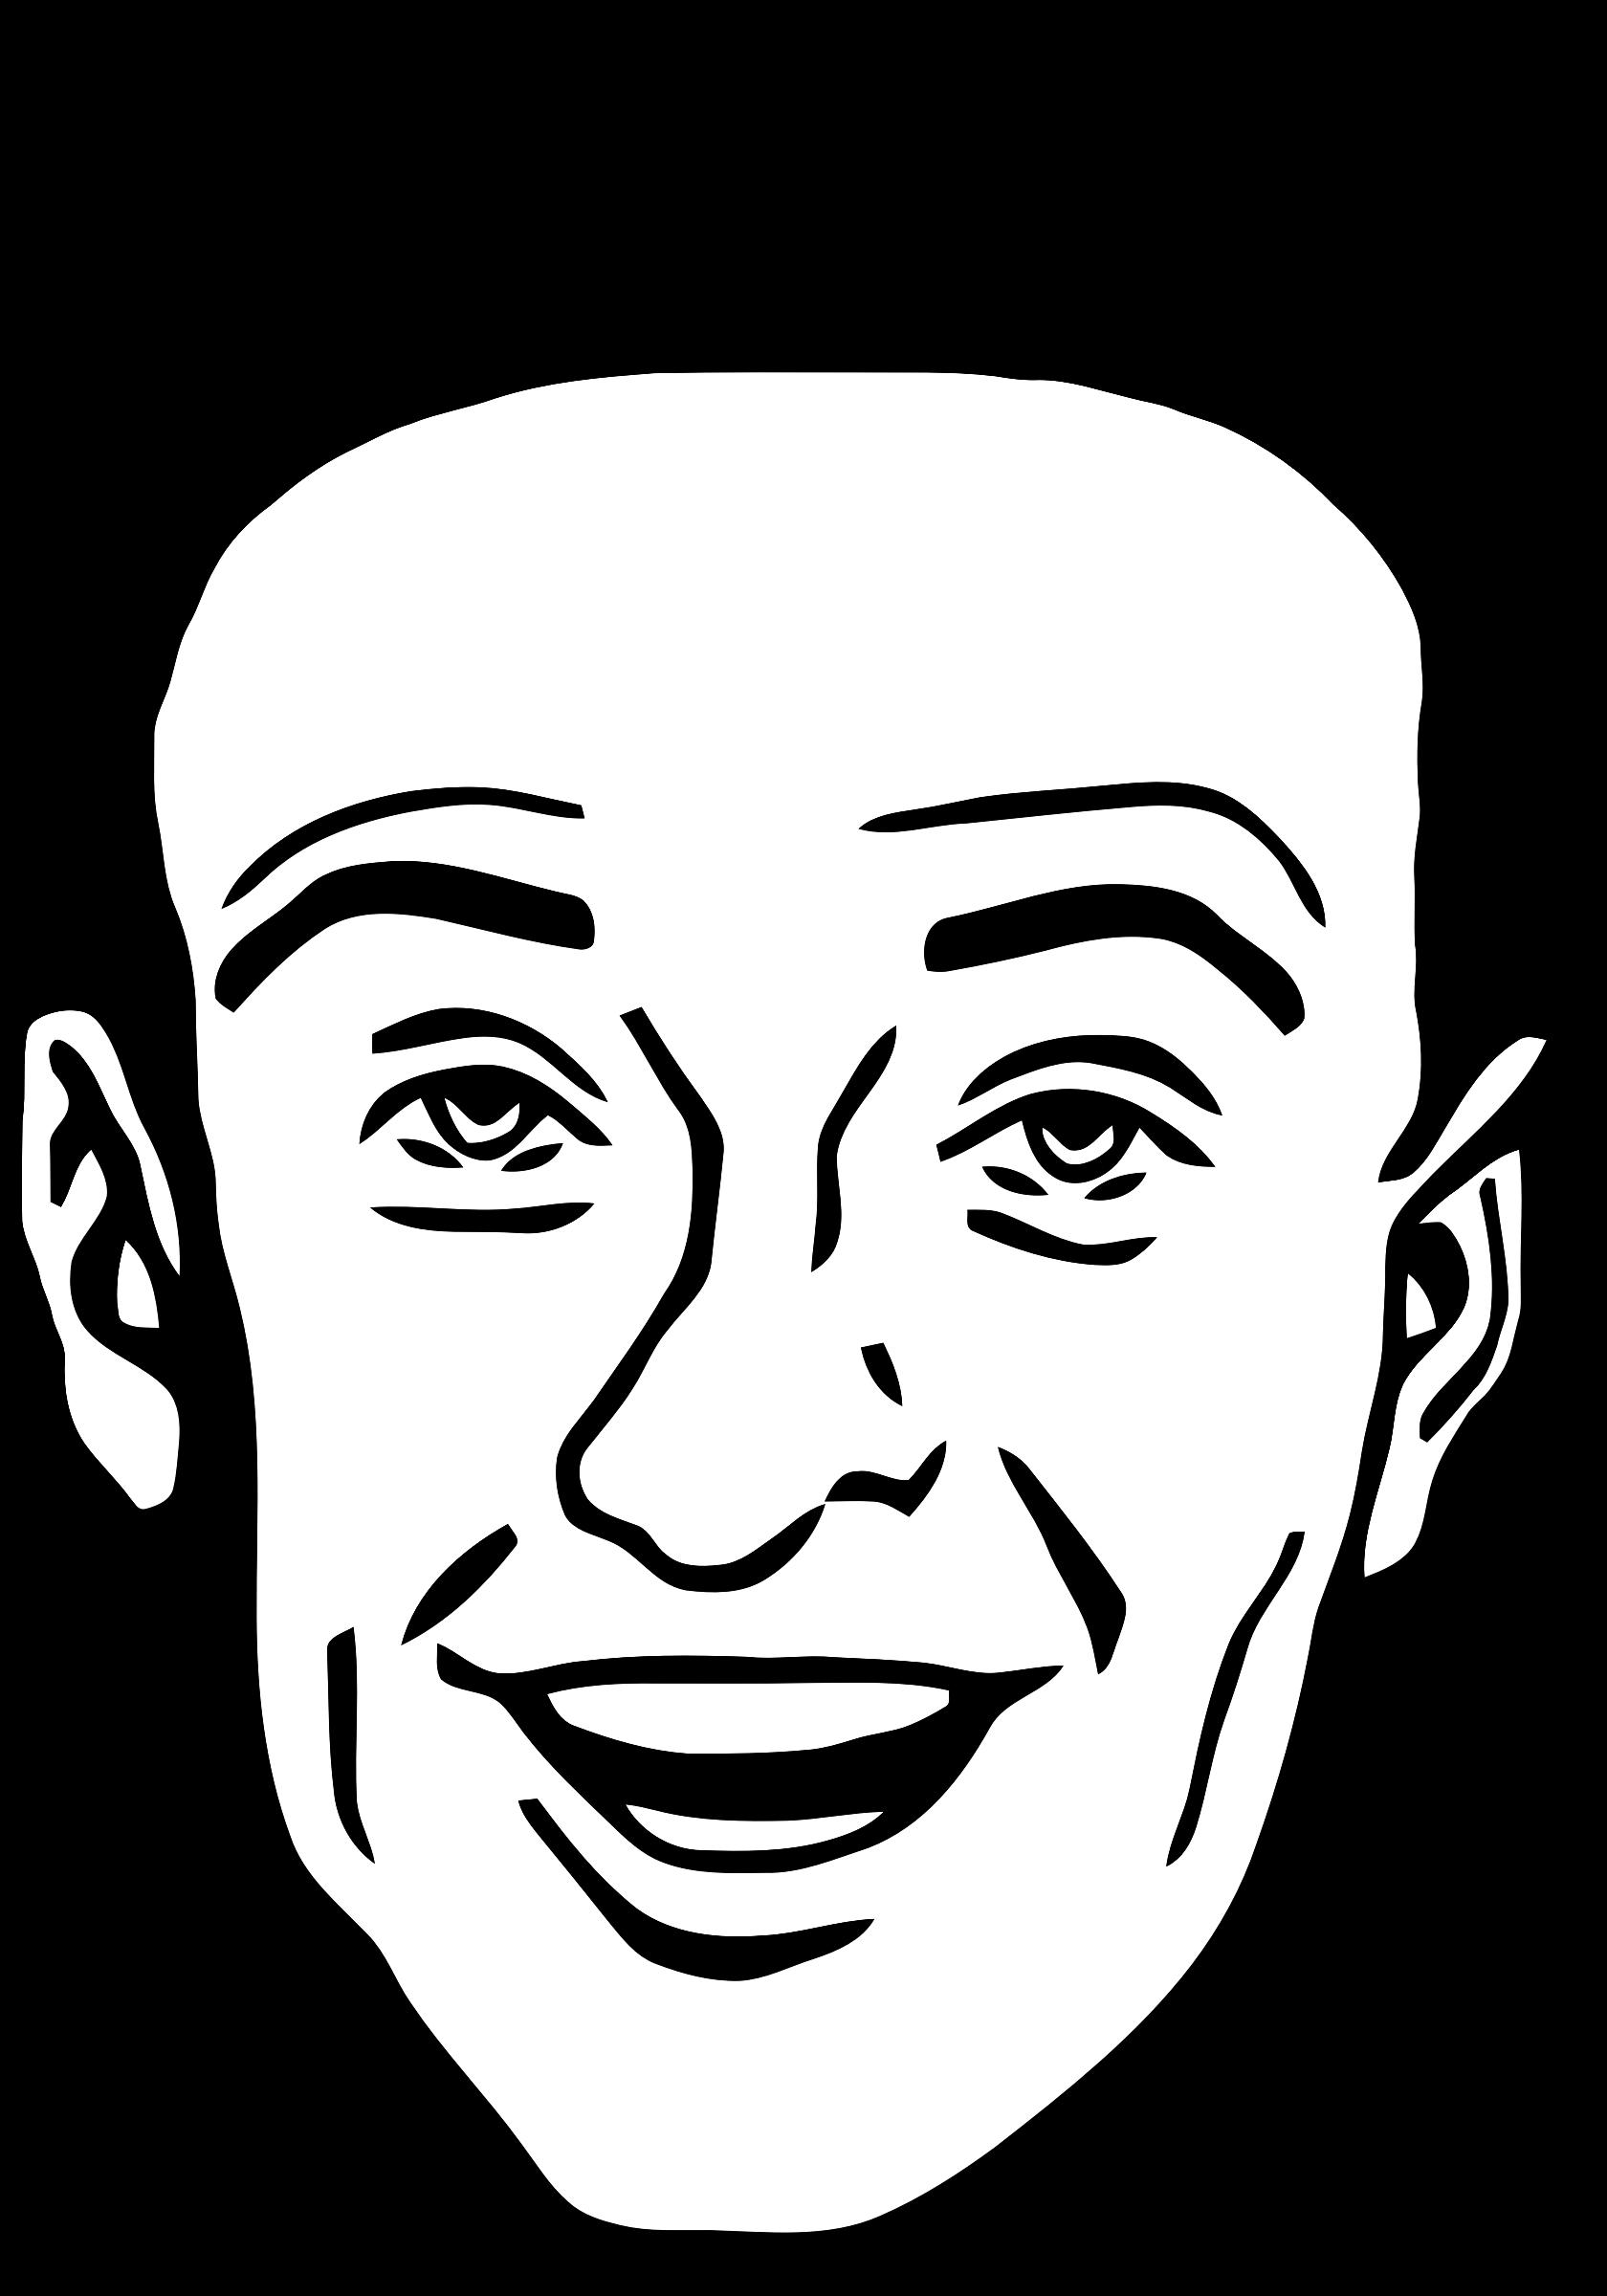 Clipart people smile. Smiling man big image